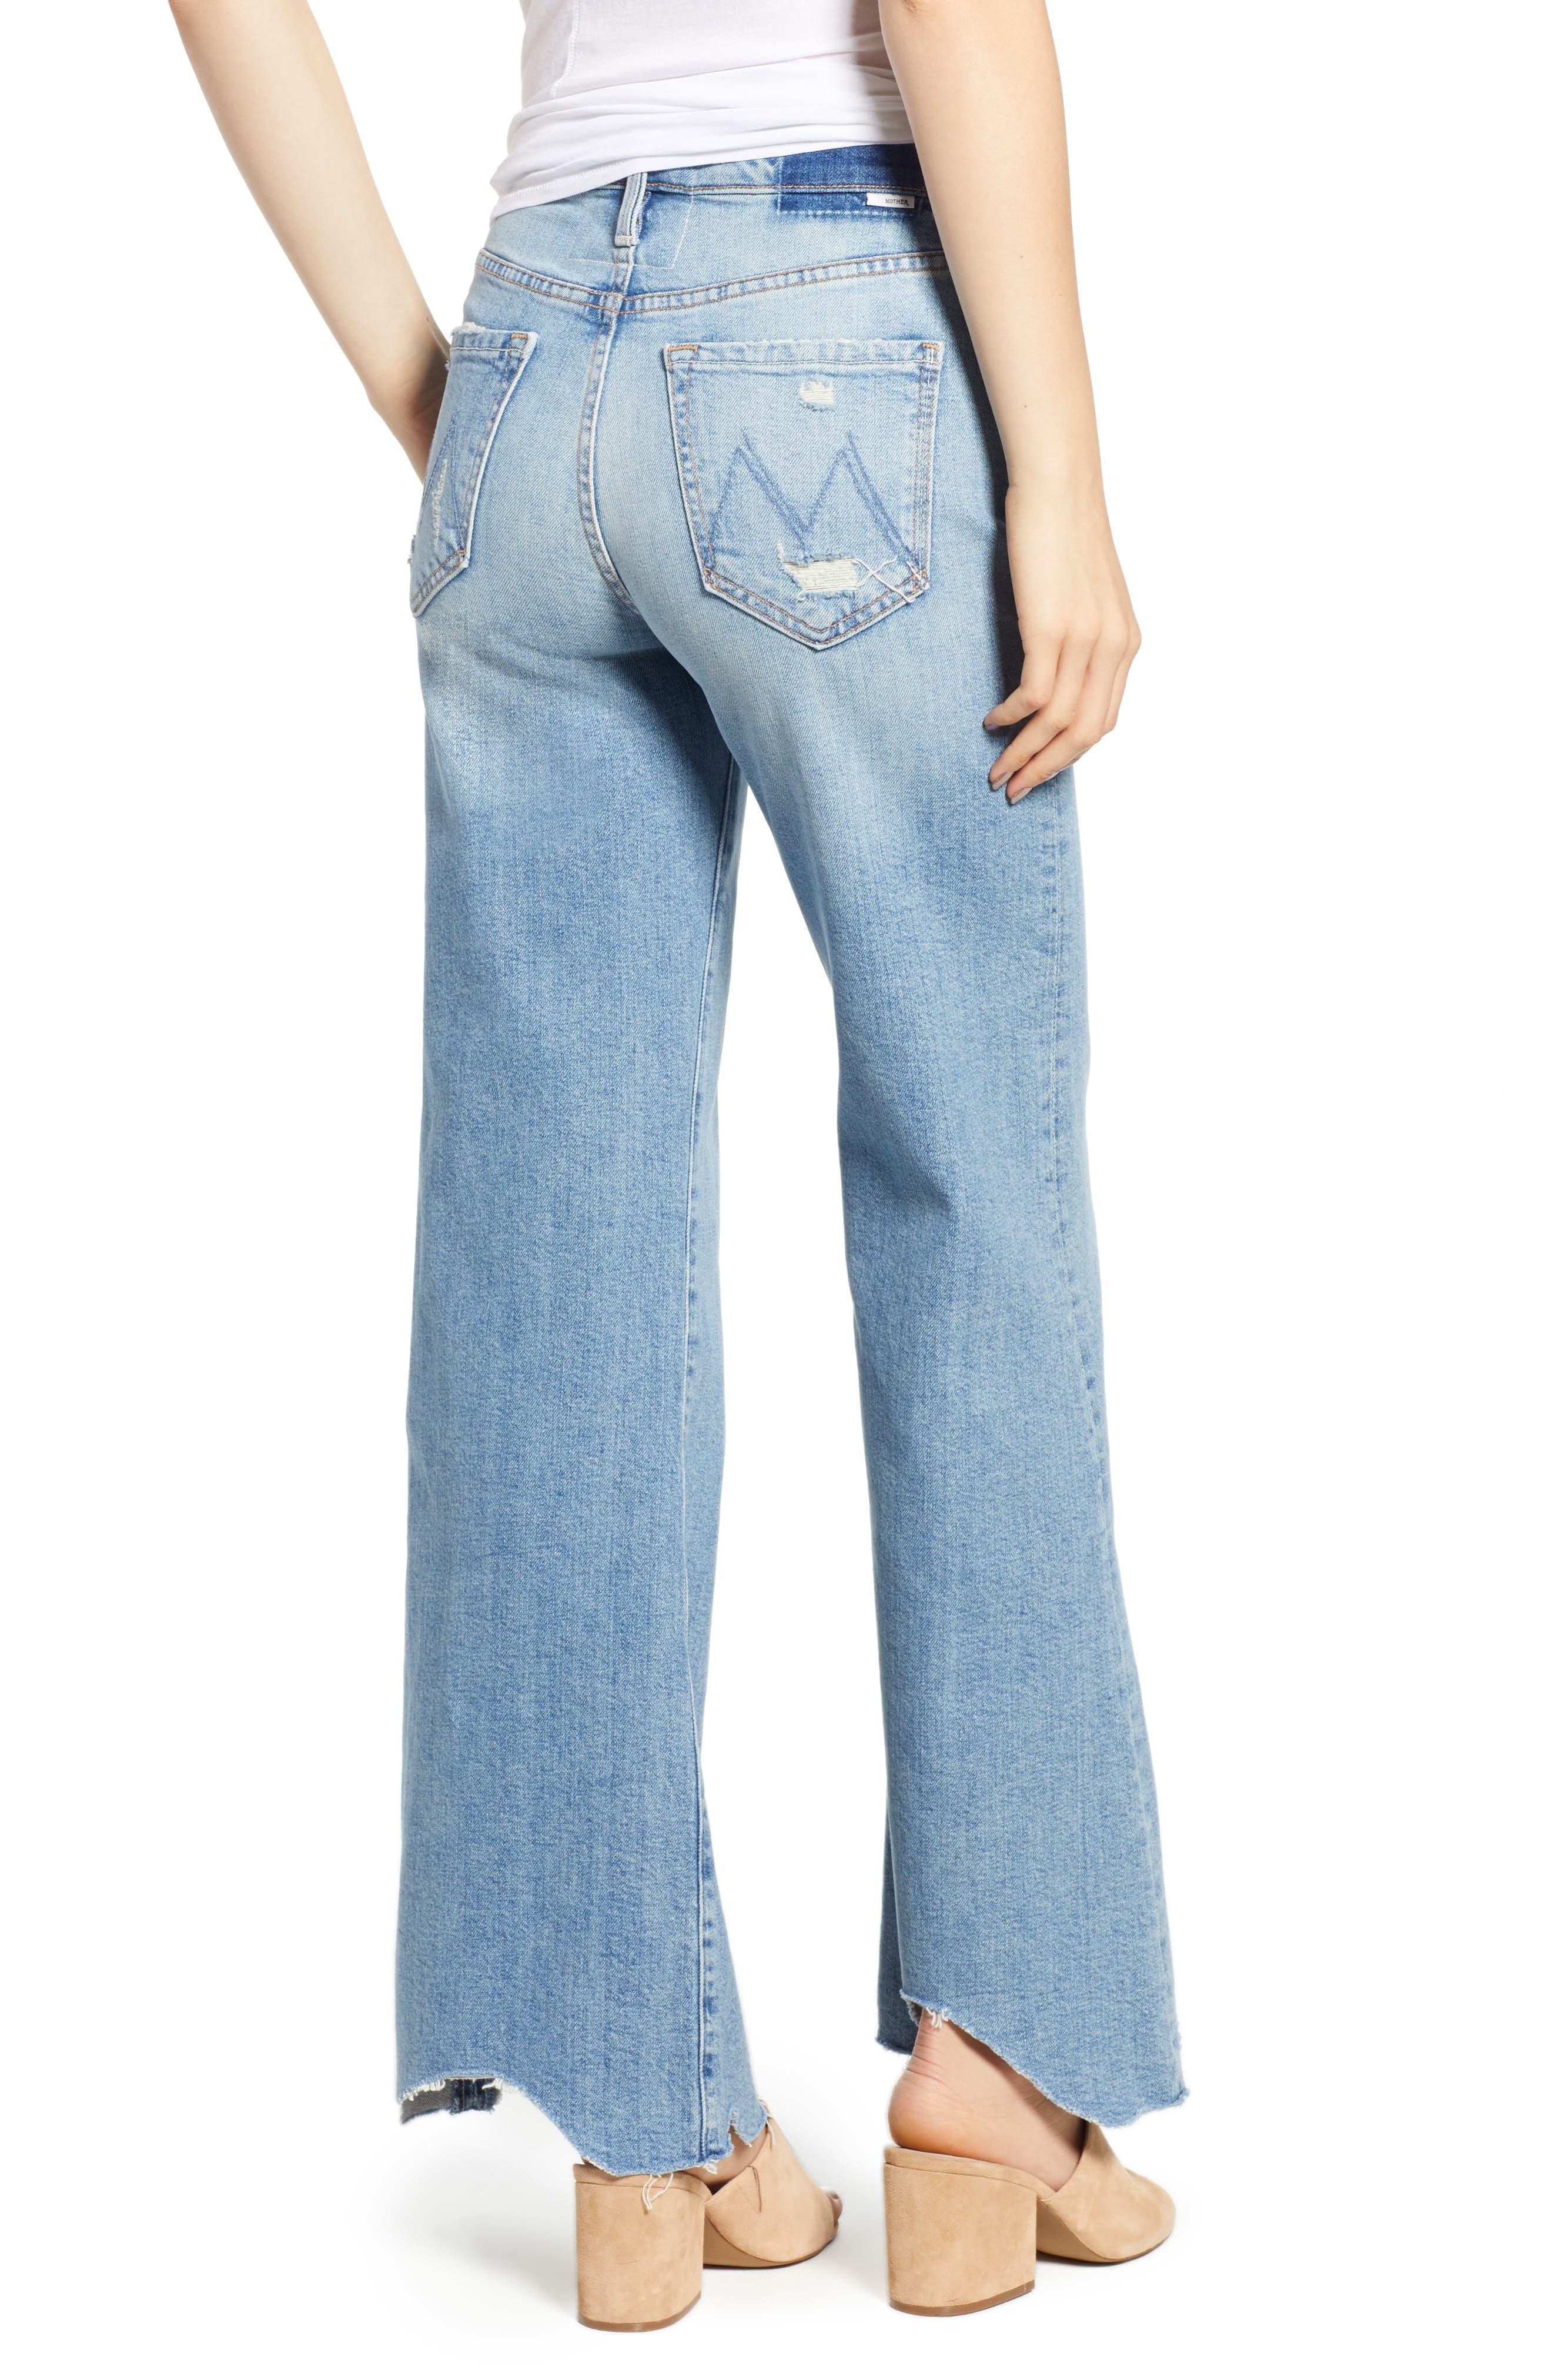 Tomcat Roller Chew Hem Jeans,                             Alternate thumbnail 2, color,                             420